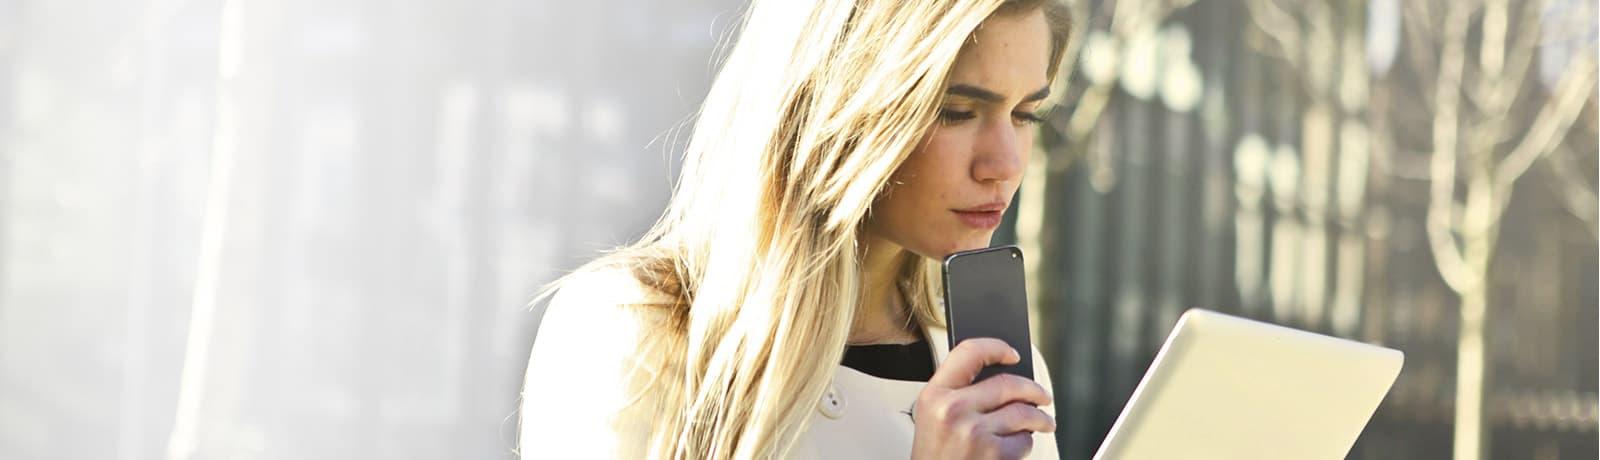 Mulher usando Inovyo no iPad